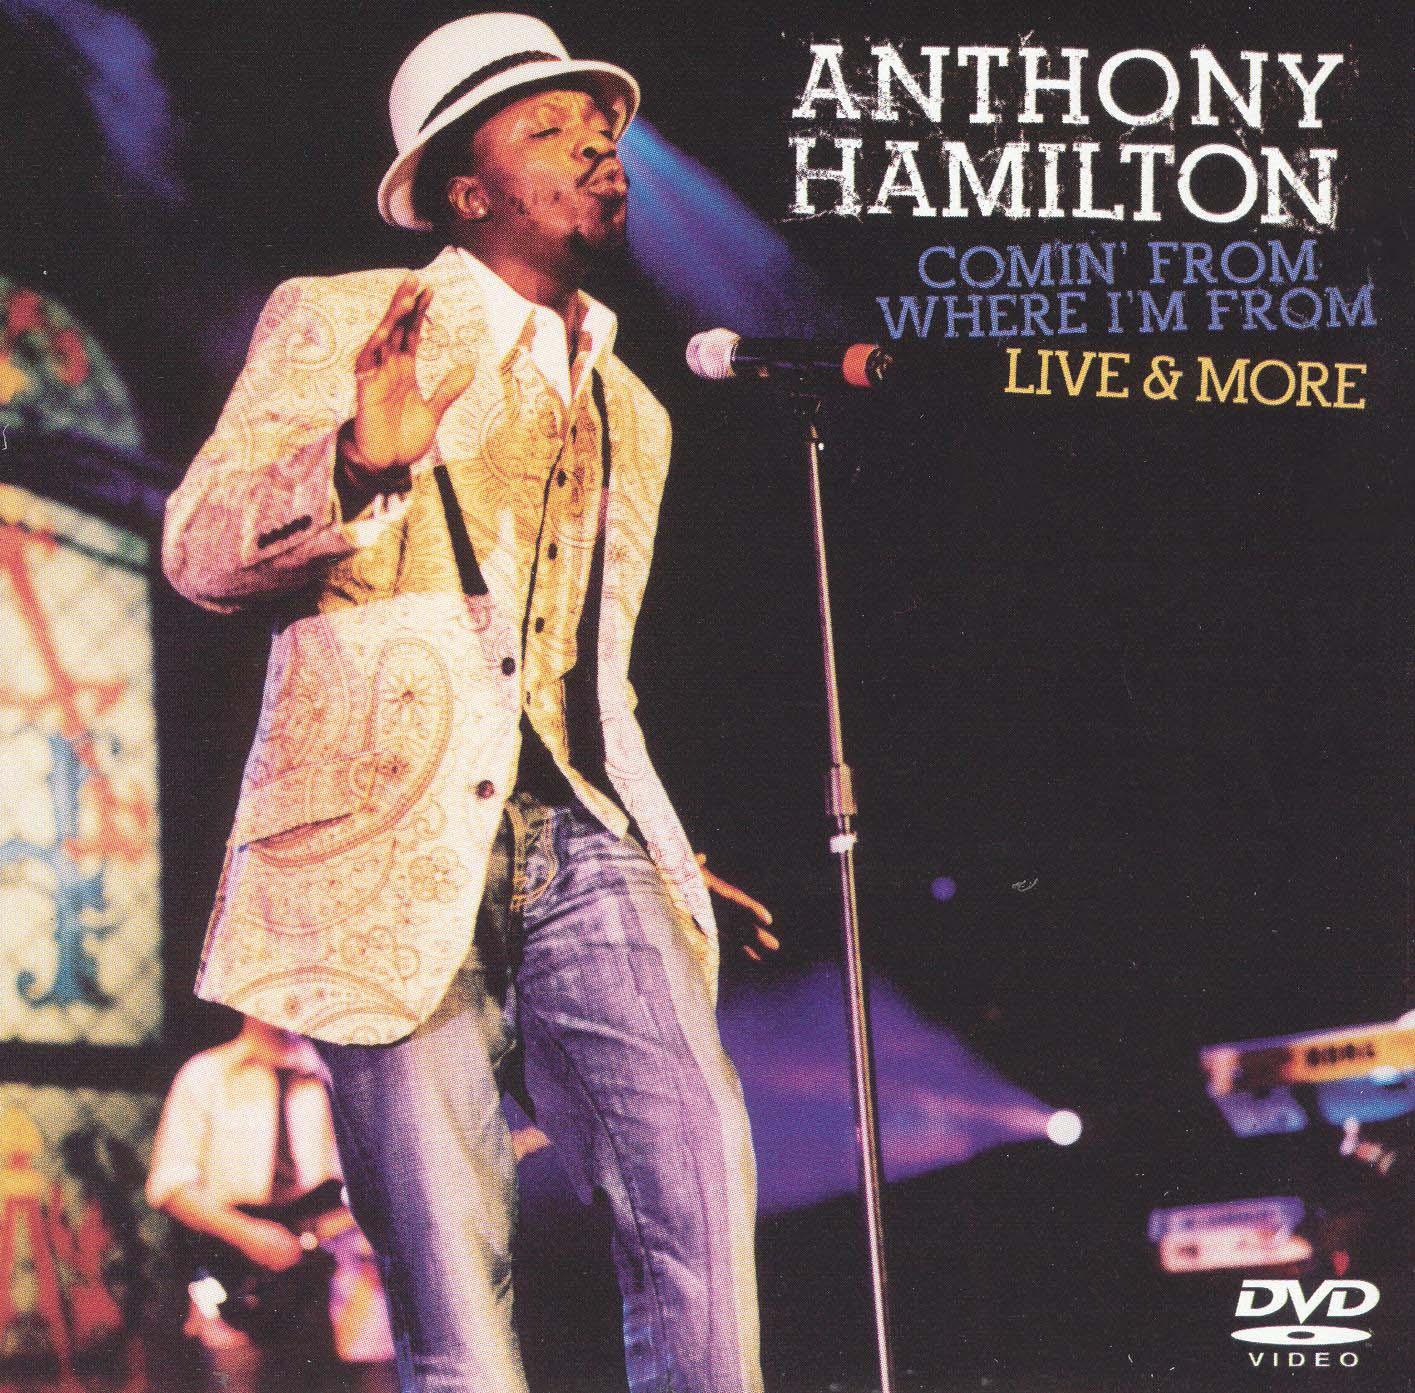 Anthony Hamilton: Live